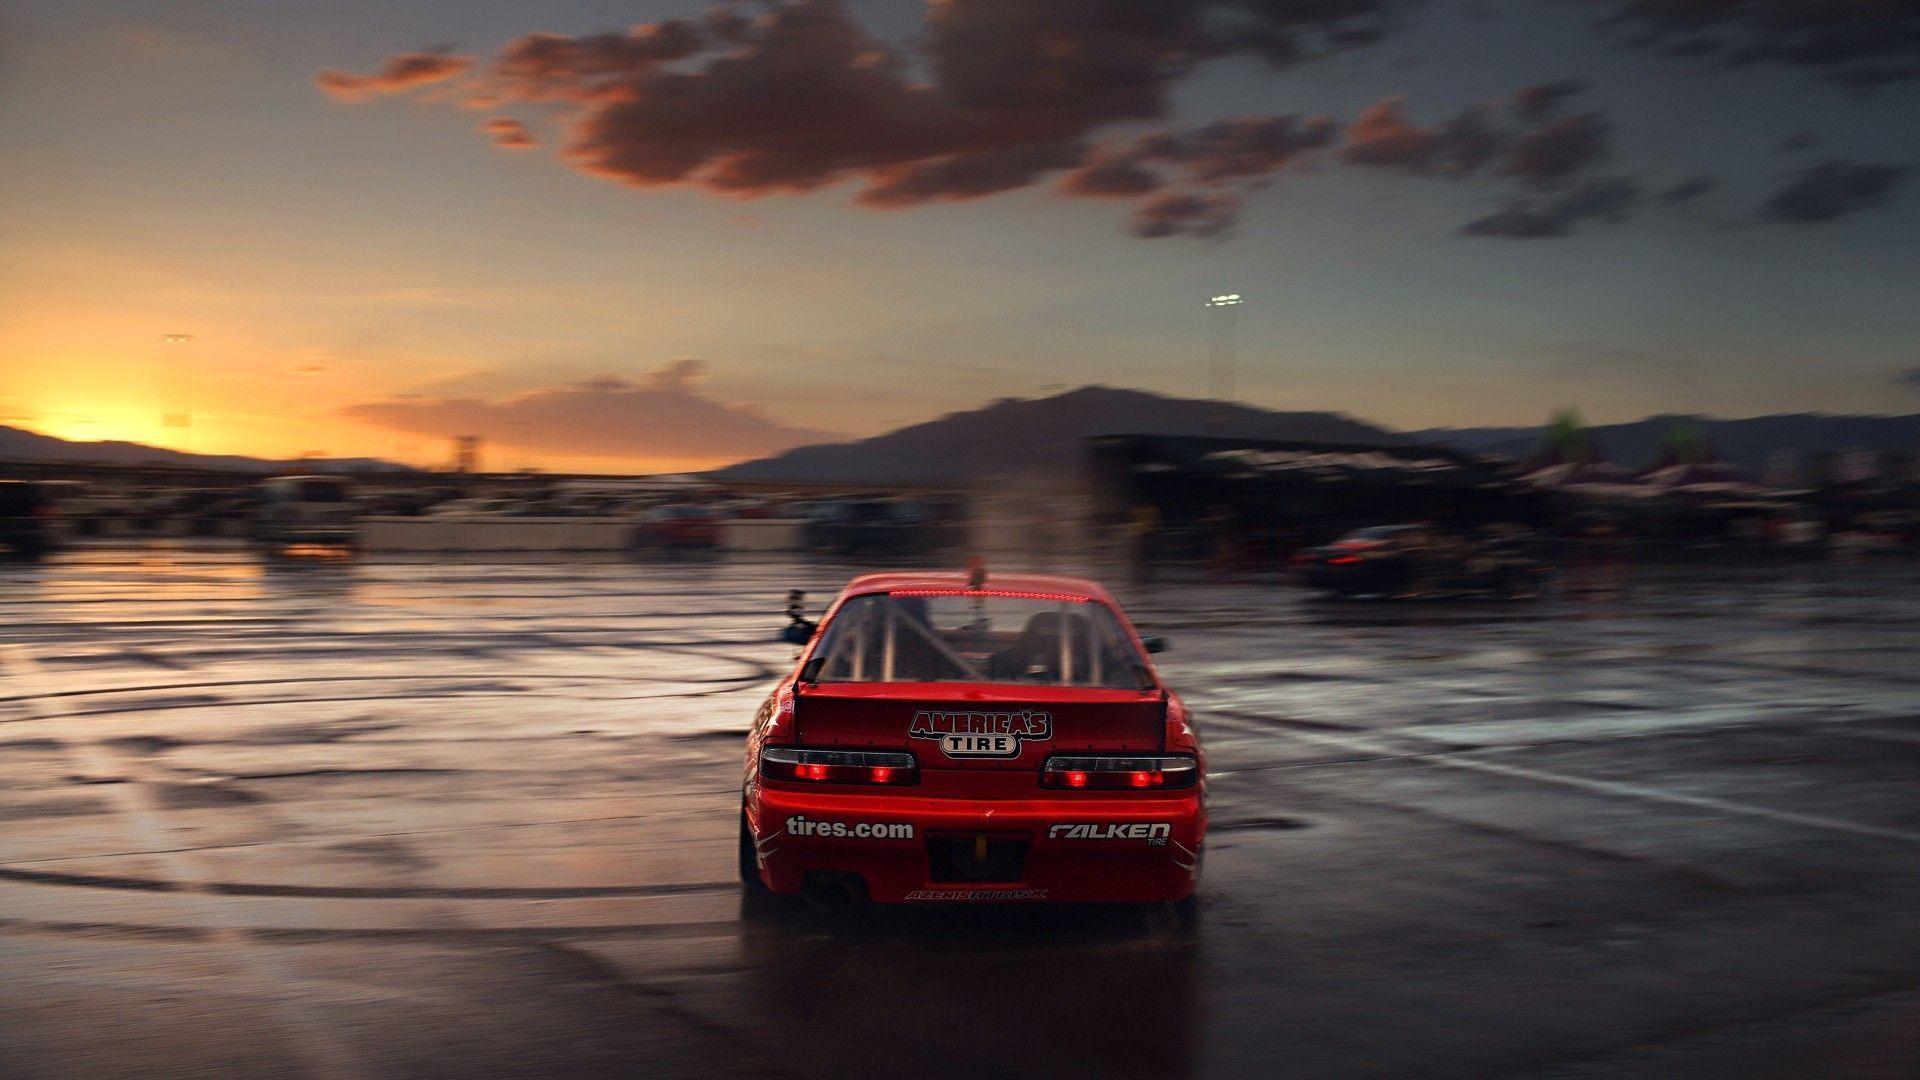 58 Best Free Drift Cars Phone Wallpapers Wallpaperaccess